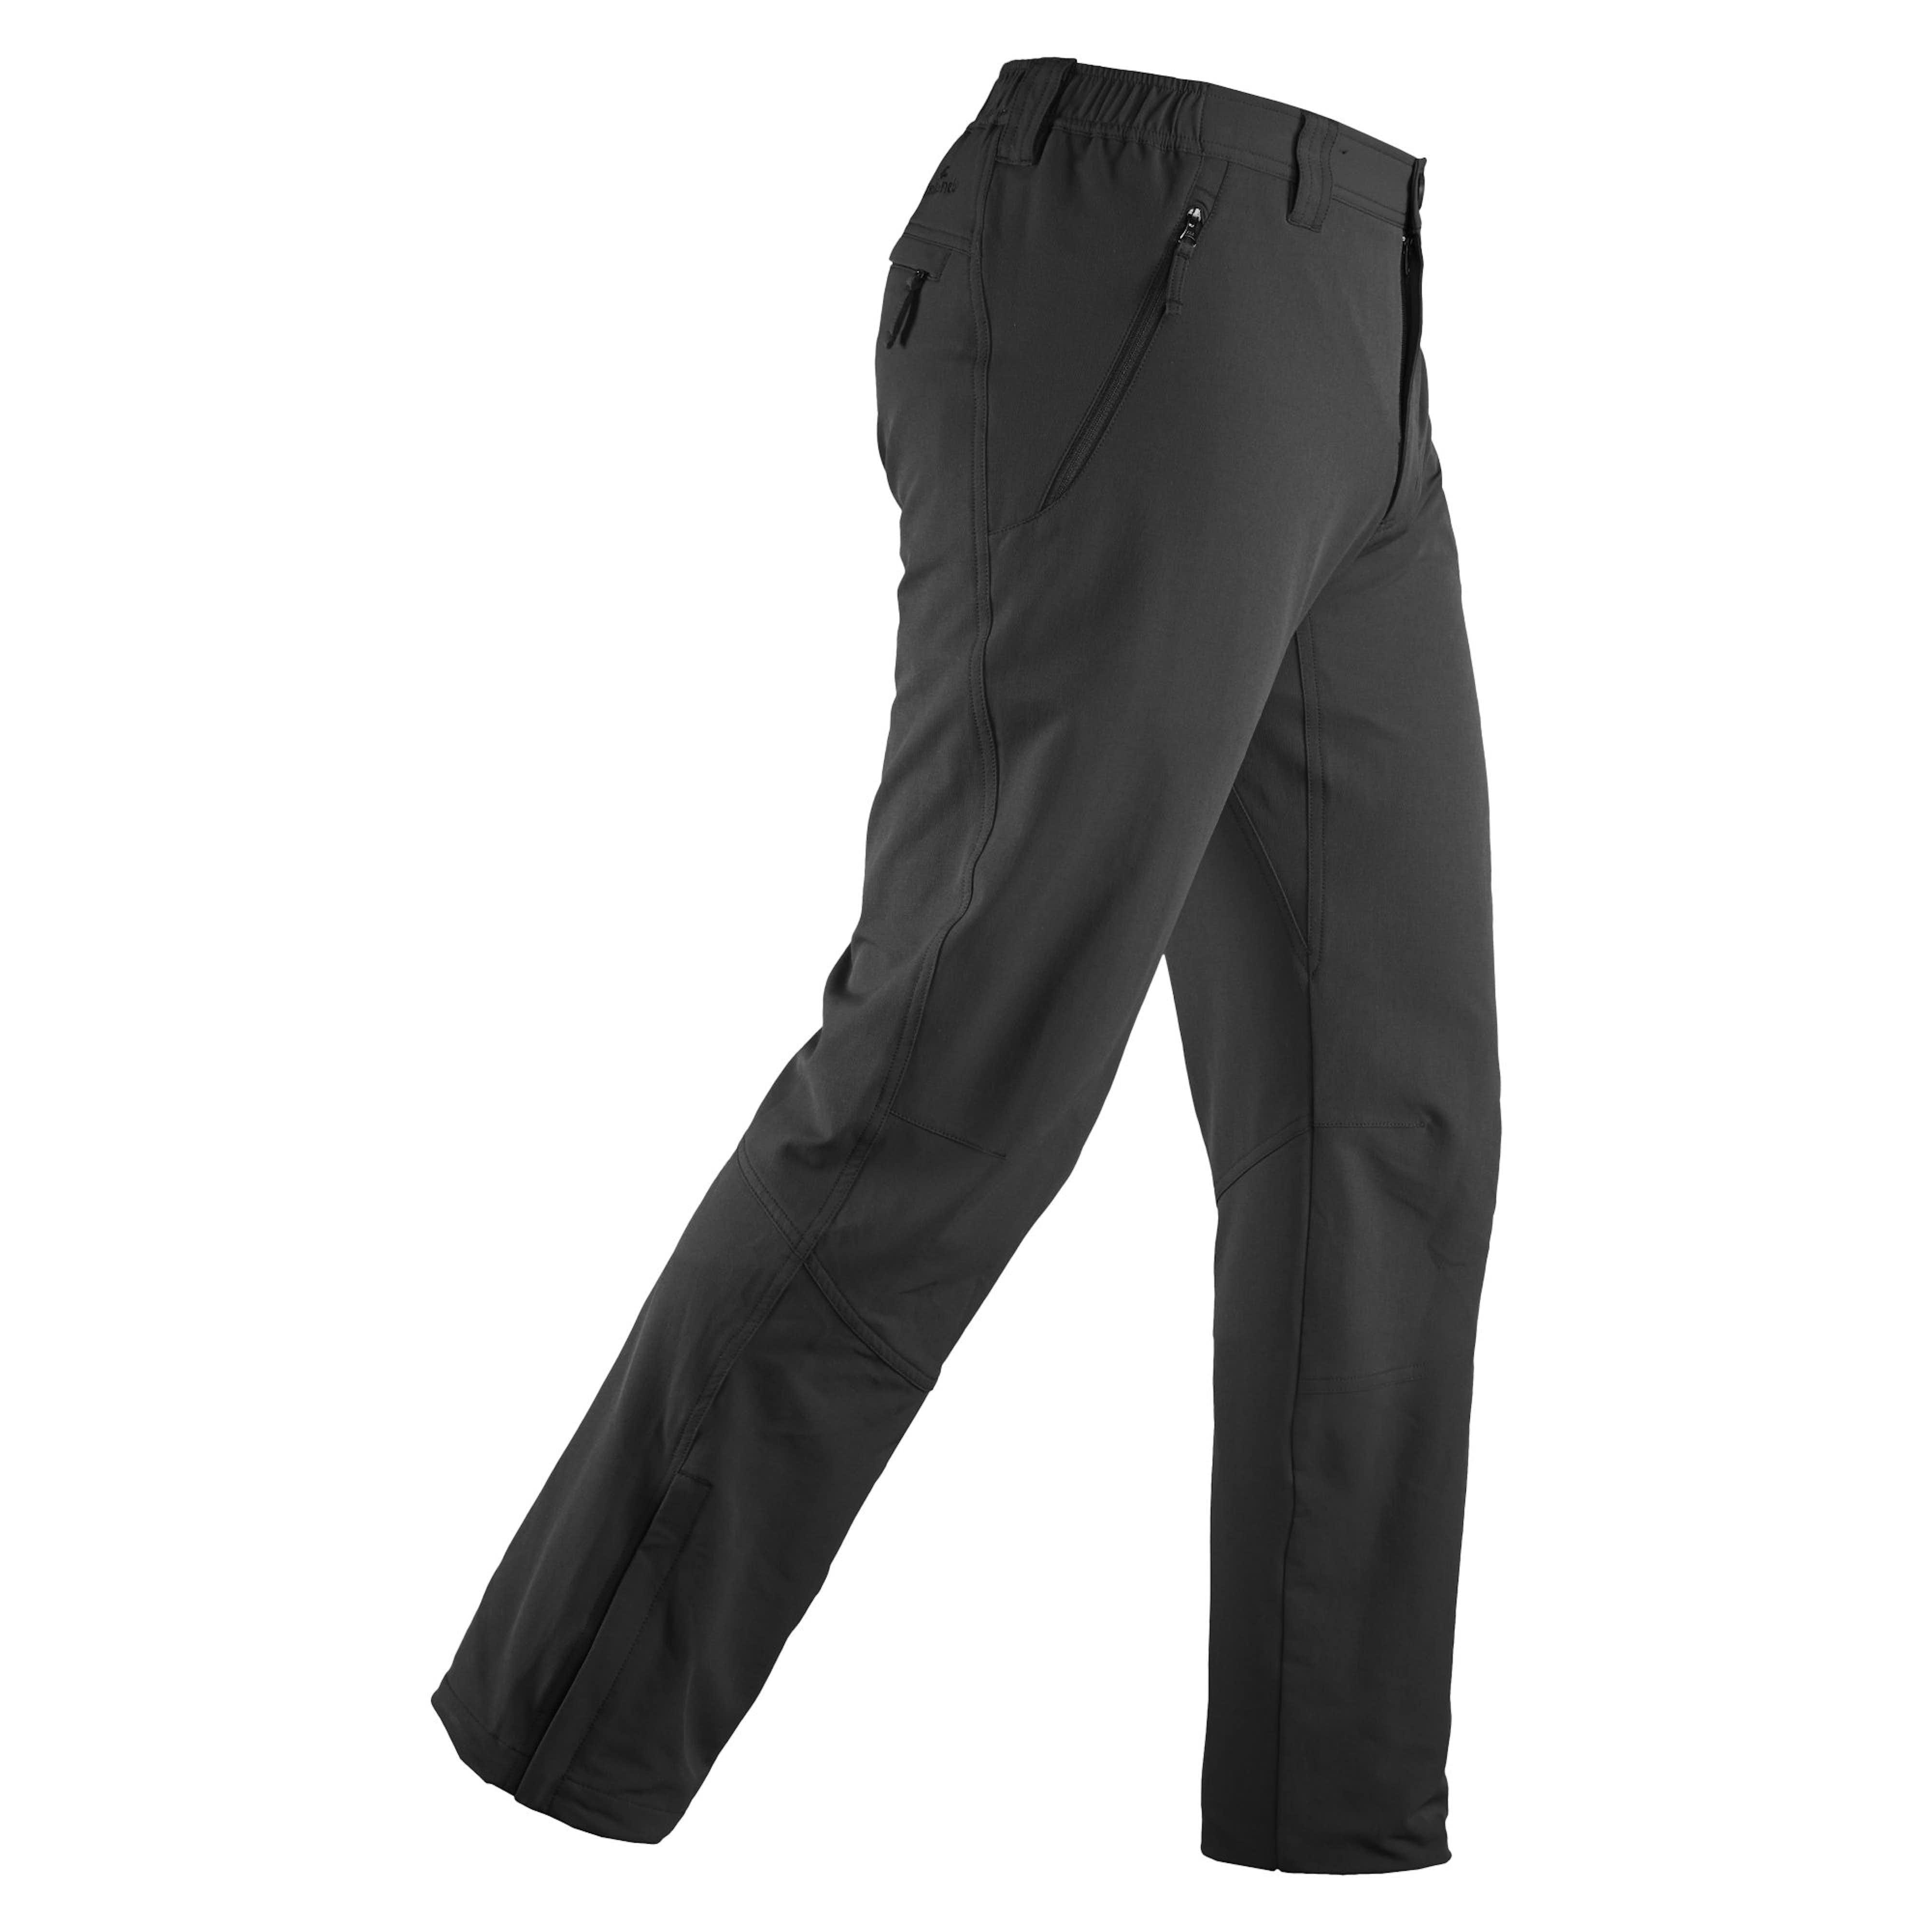 5ca41399fa60 Tupelo Men's Softshell Hiking Pants v2 - Black